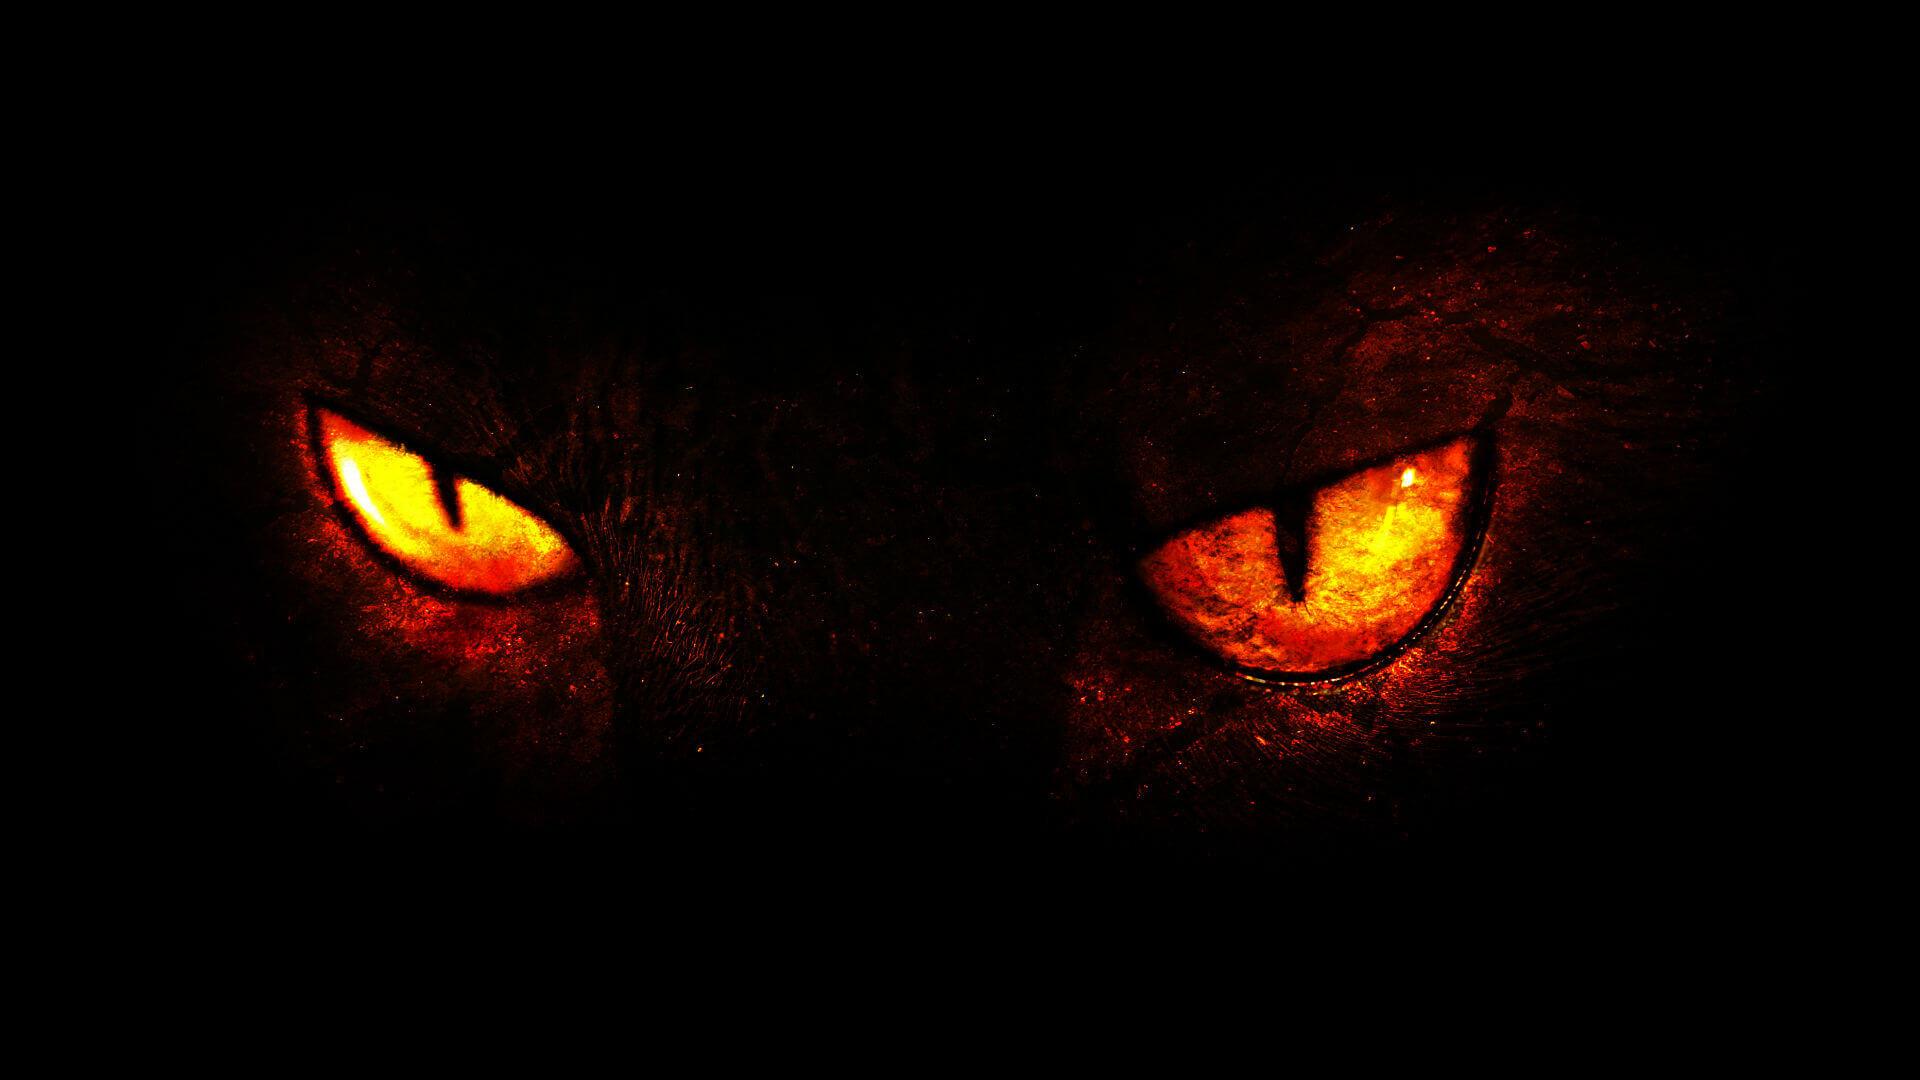 creepy-demon-eyes-monster-ss-1920